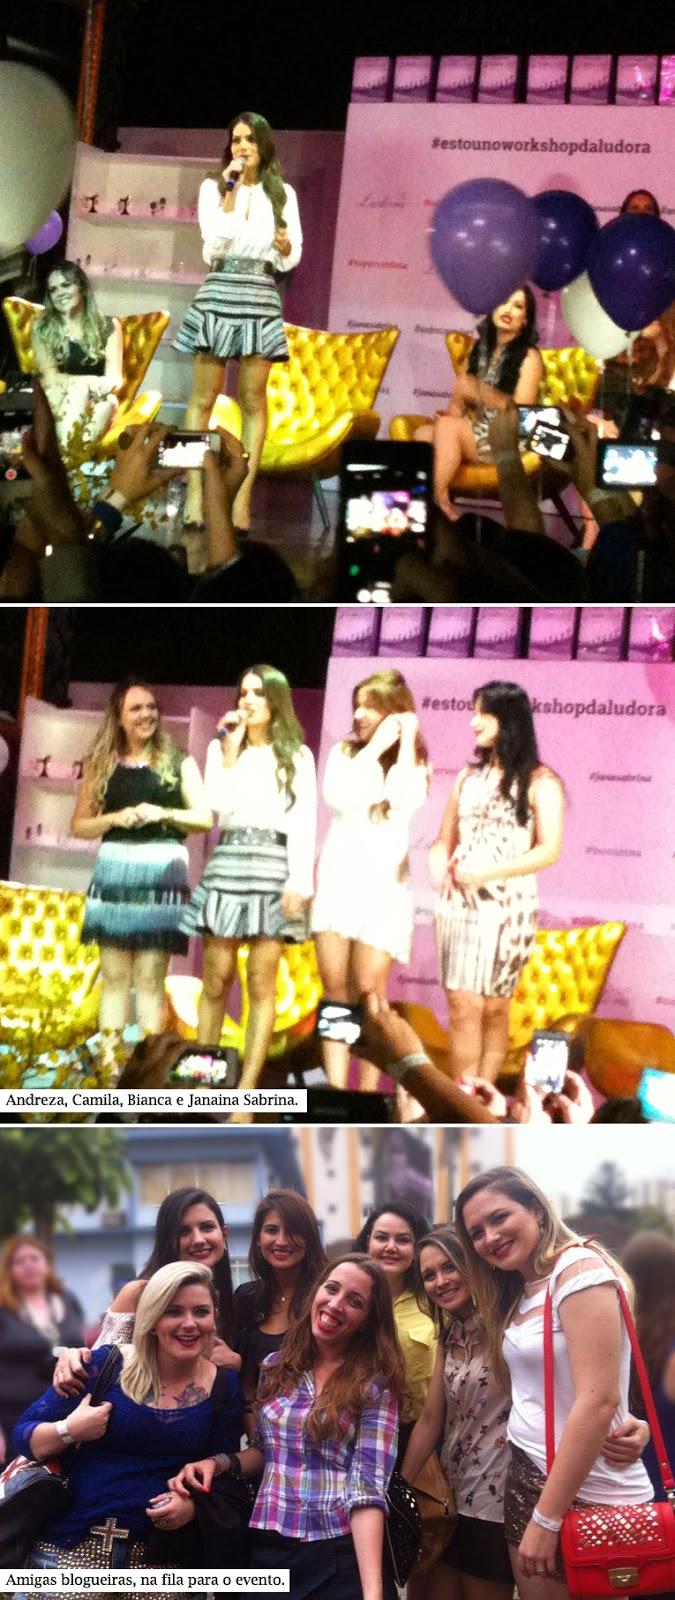 Joinville, Blogueiras, Make Up, Camila Coelho, Andreza Goulart, Janaina Sabrina, Bianca, Boca Rosa,